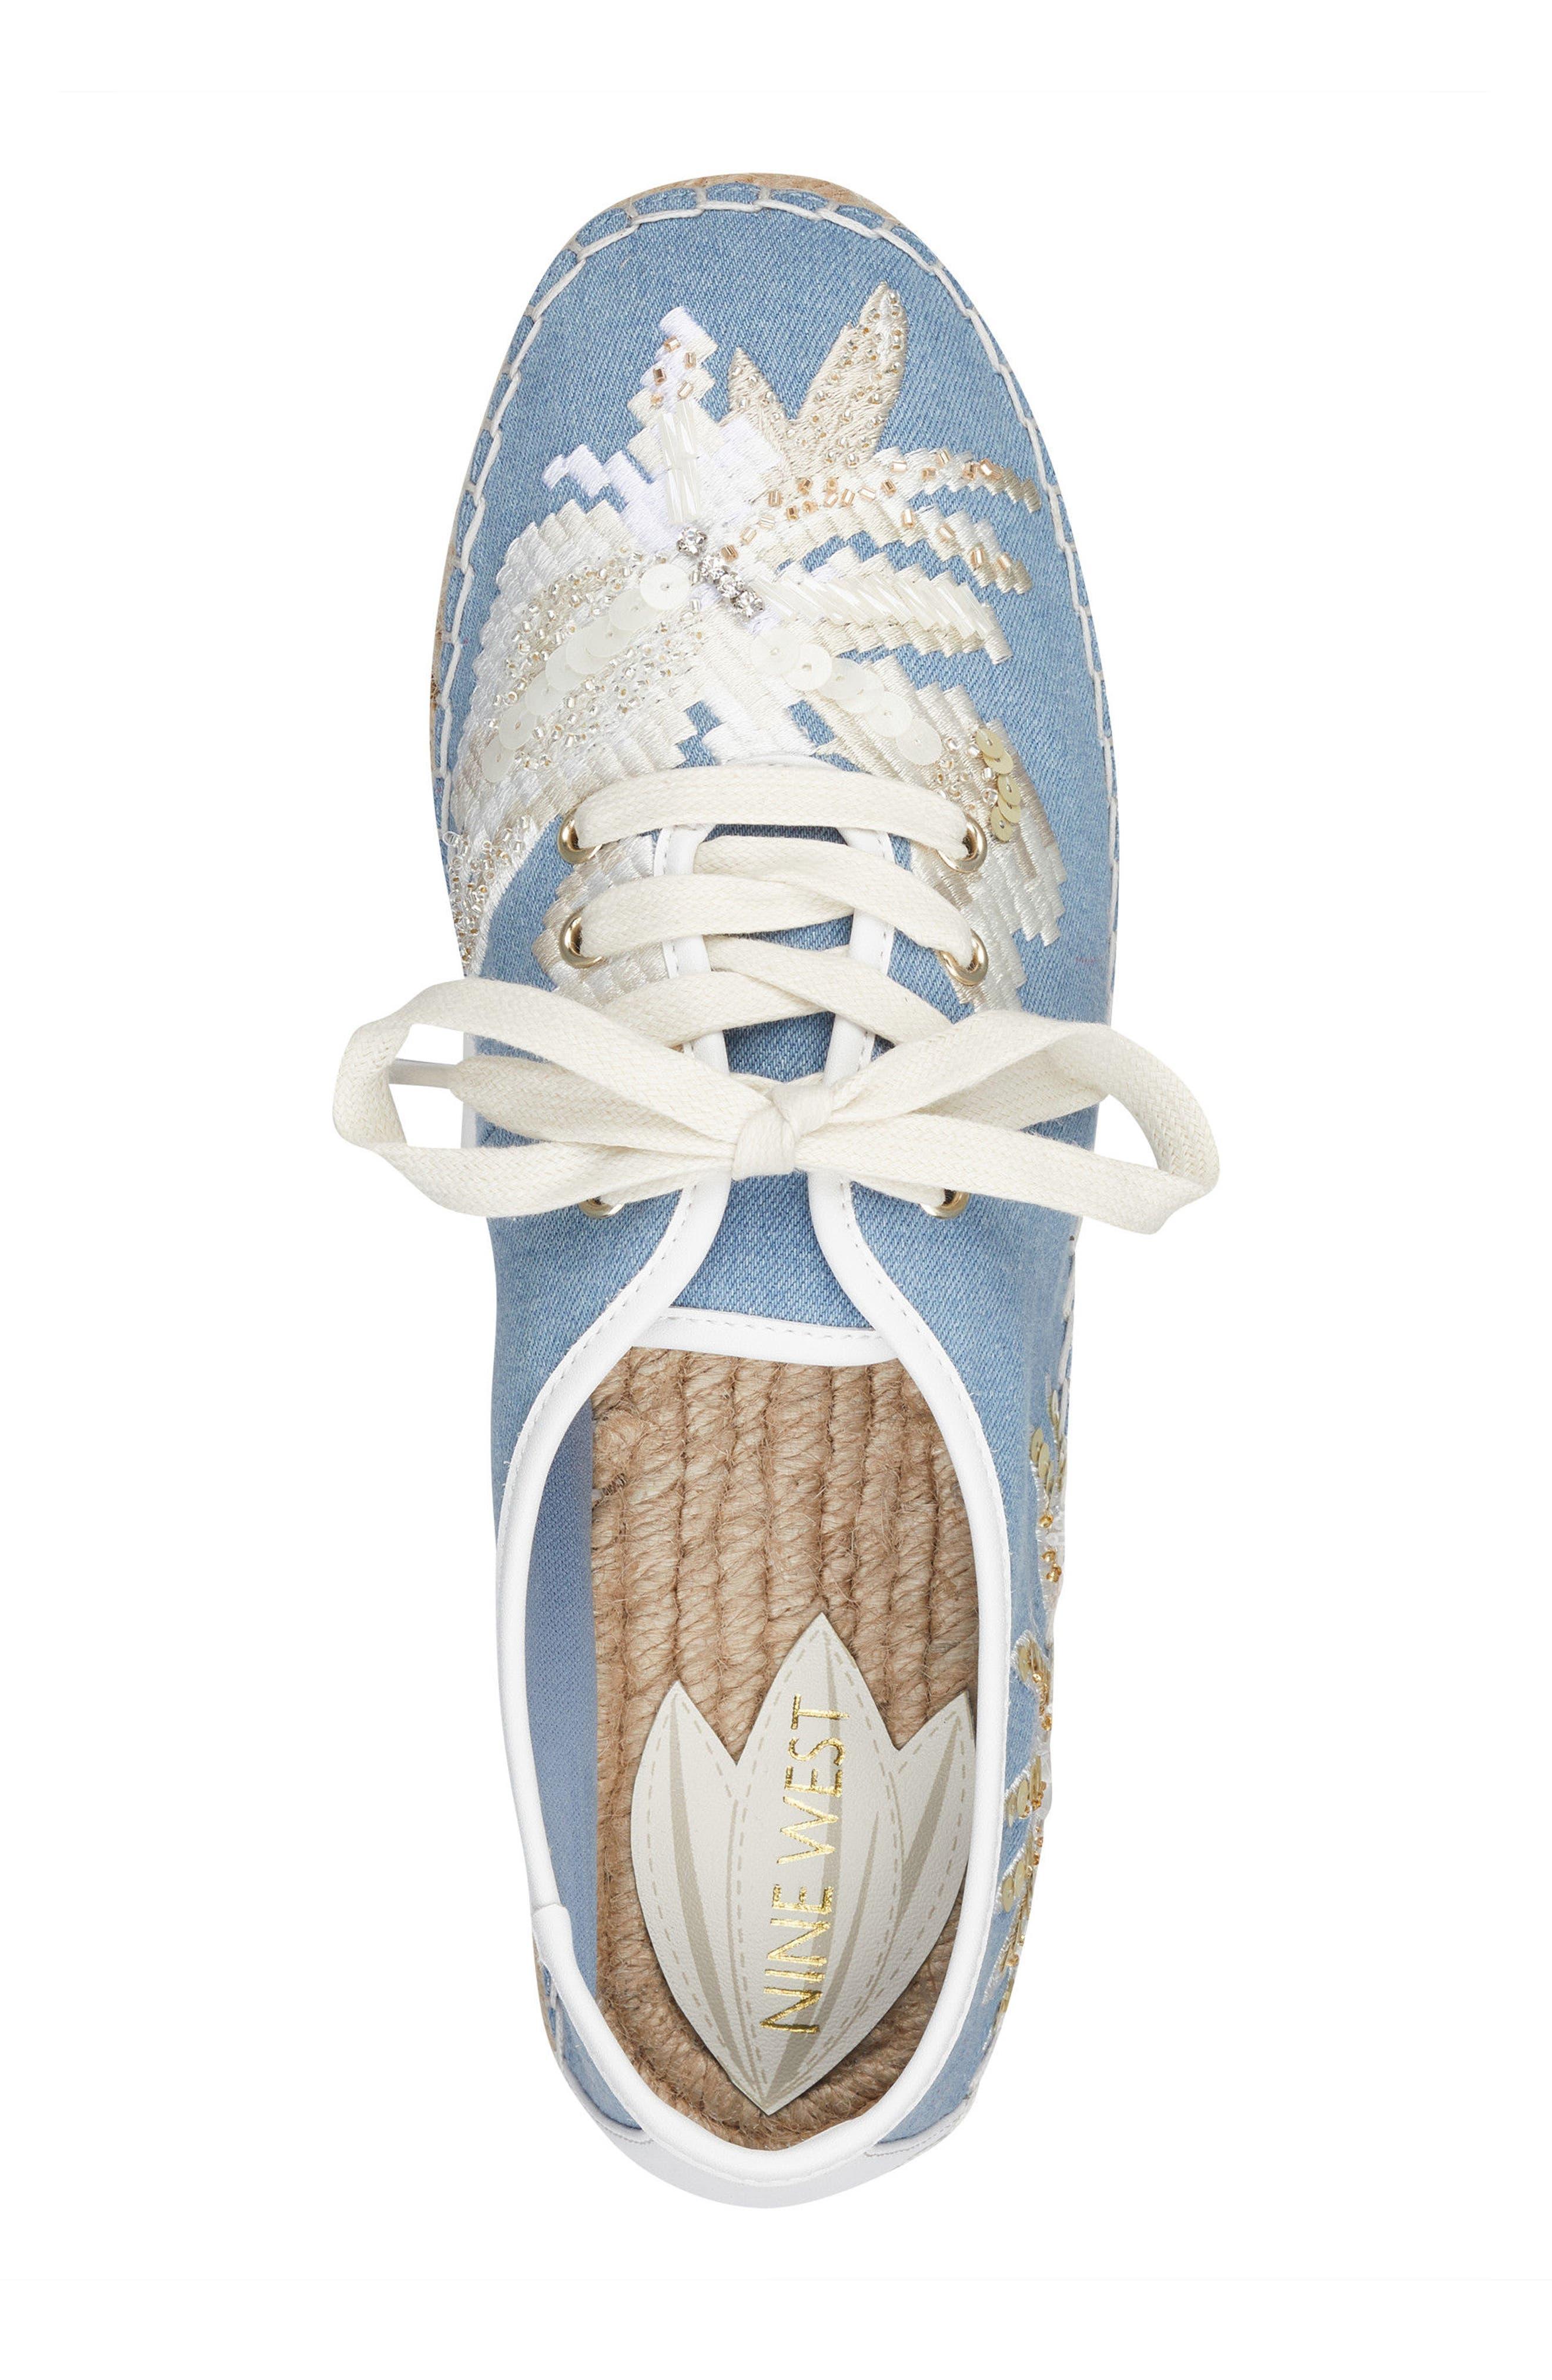 Guinup Embellished Espadrille Sneaker,                             Alternate thumbnail 5, color,                             Light Blue/ White Denim